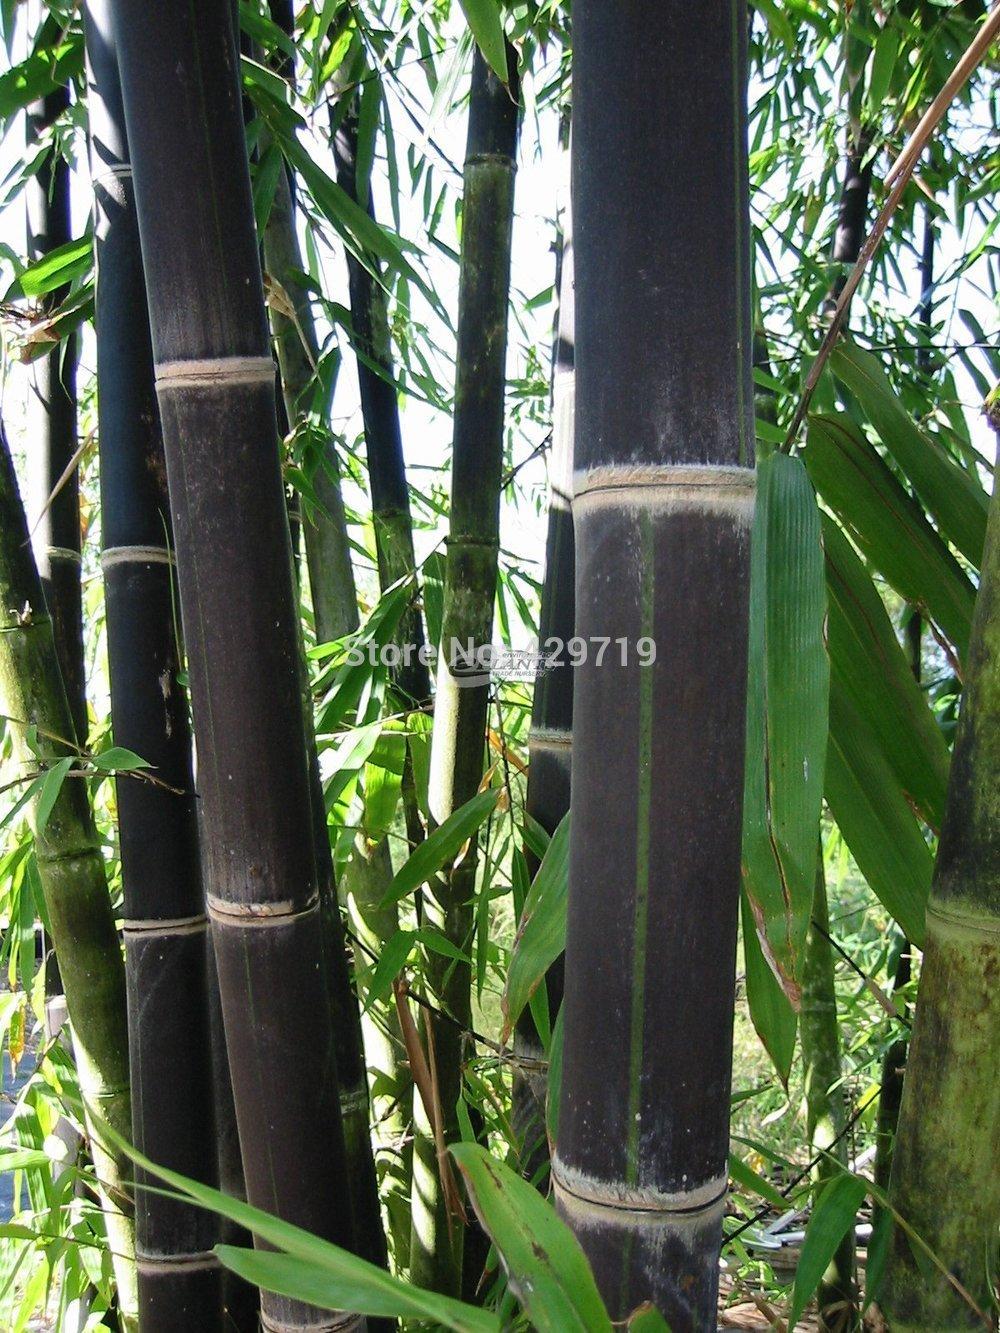 100 bamboo seeds rare giant black moso bamboo bambu seeds professional pack